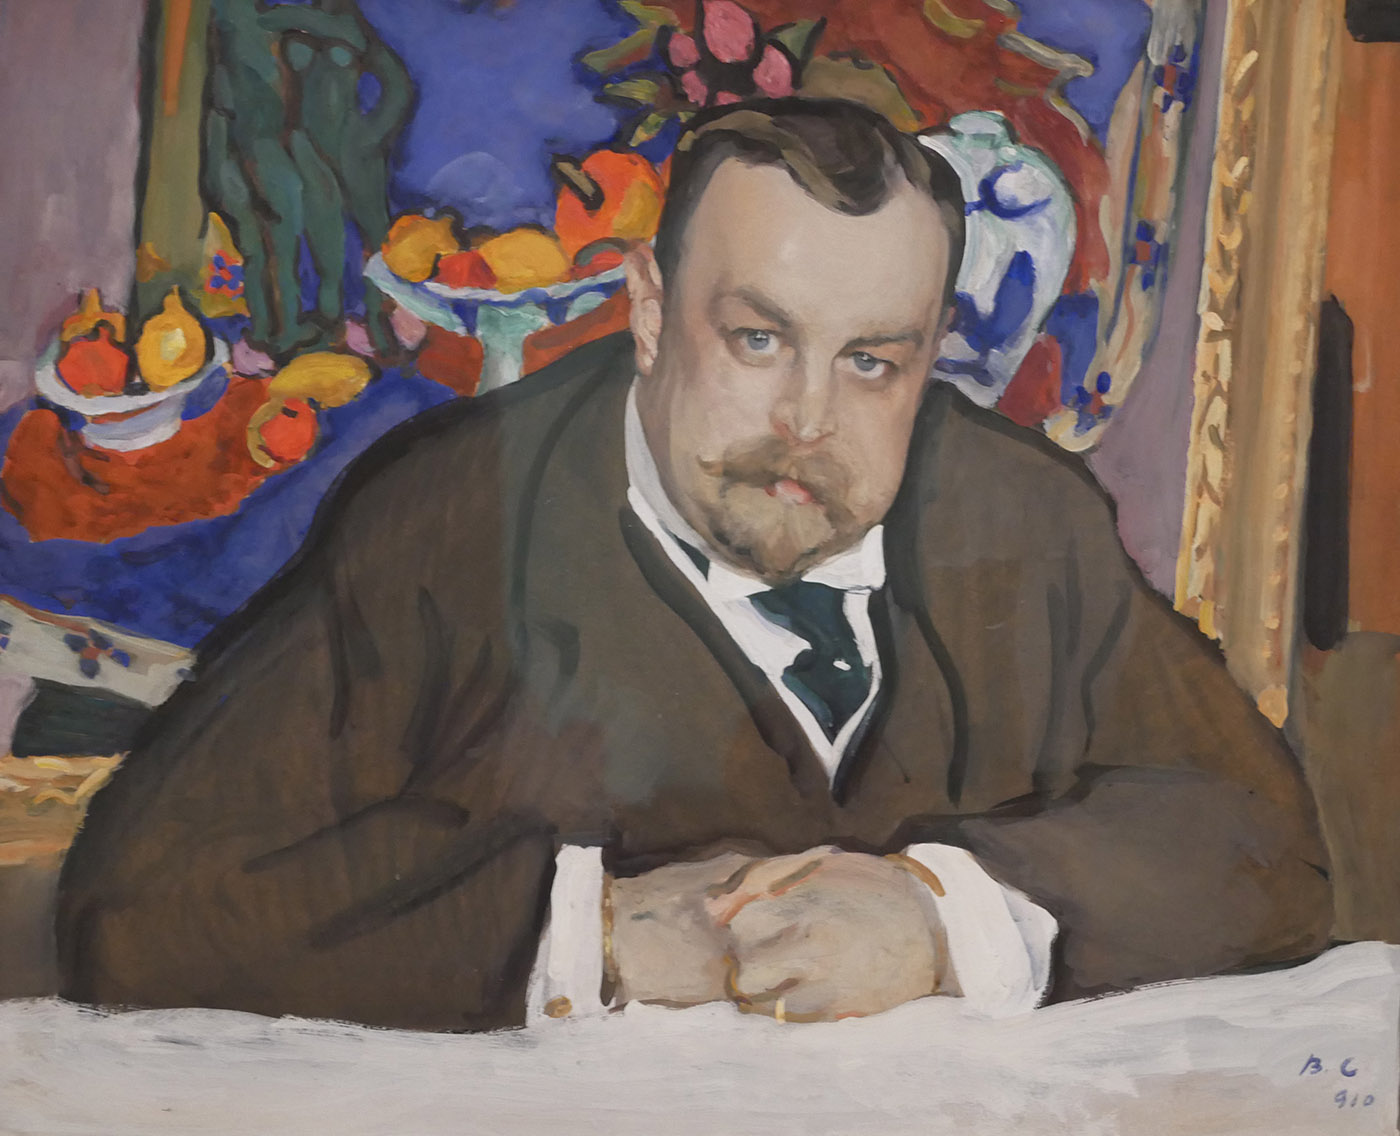 Exhibition Morozov Collection at the Louis Vuitton Foundation